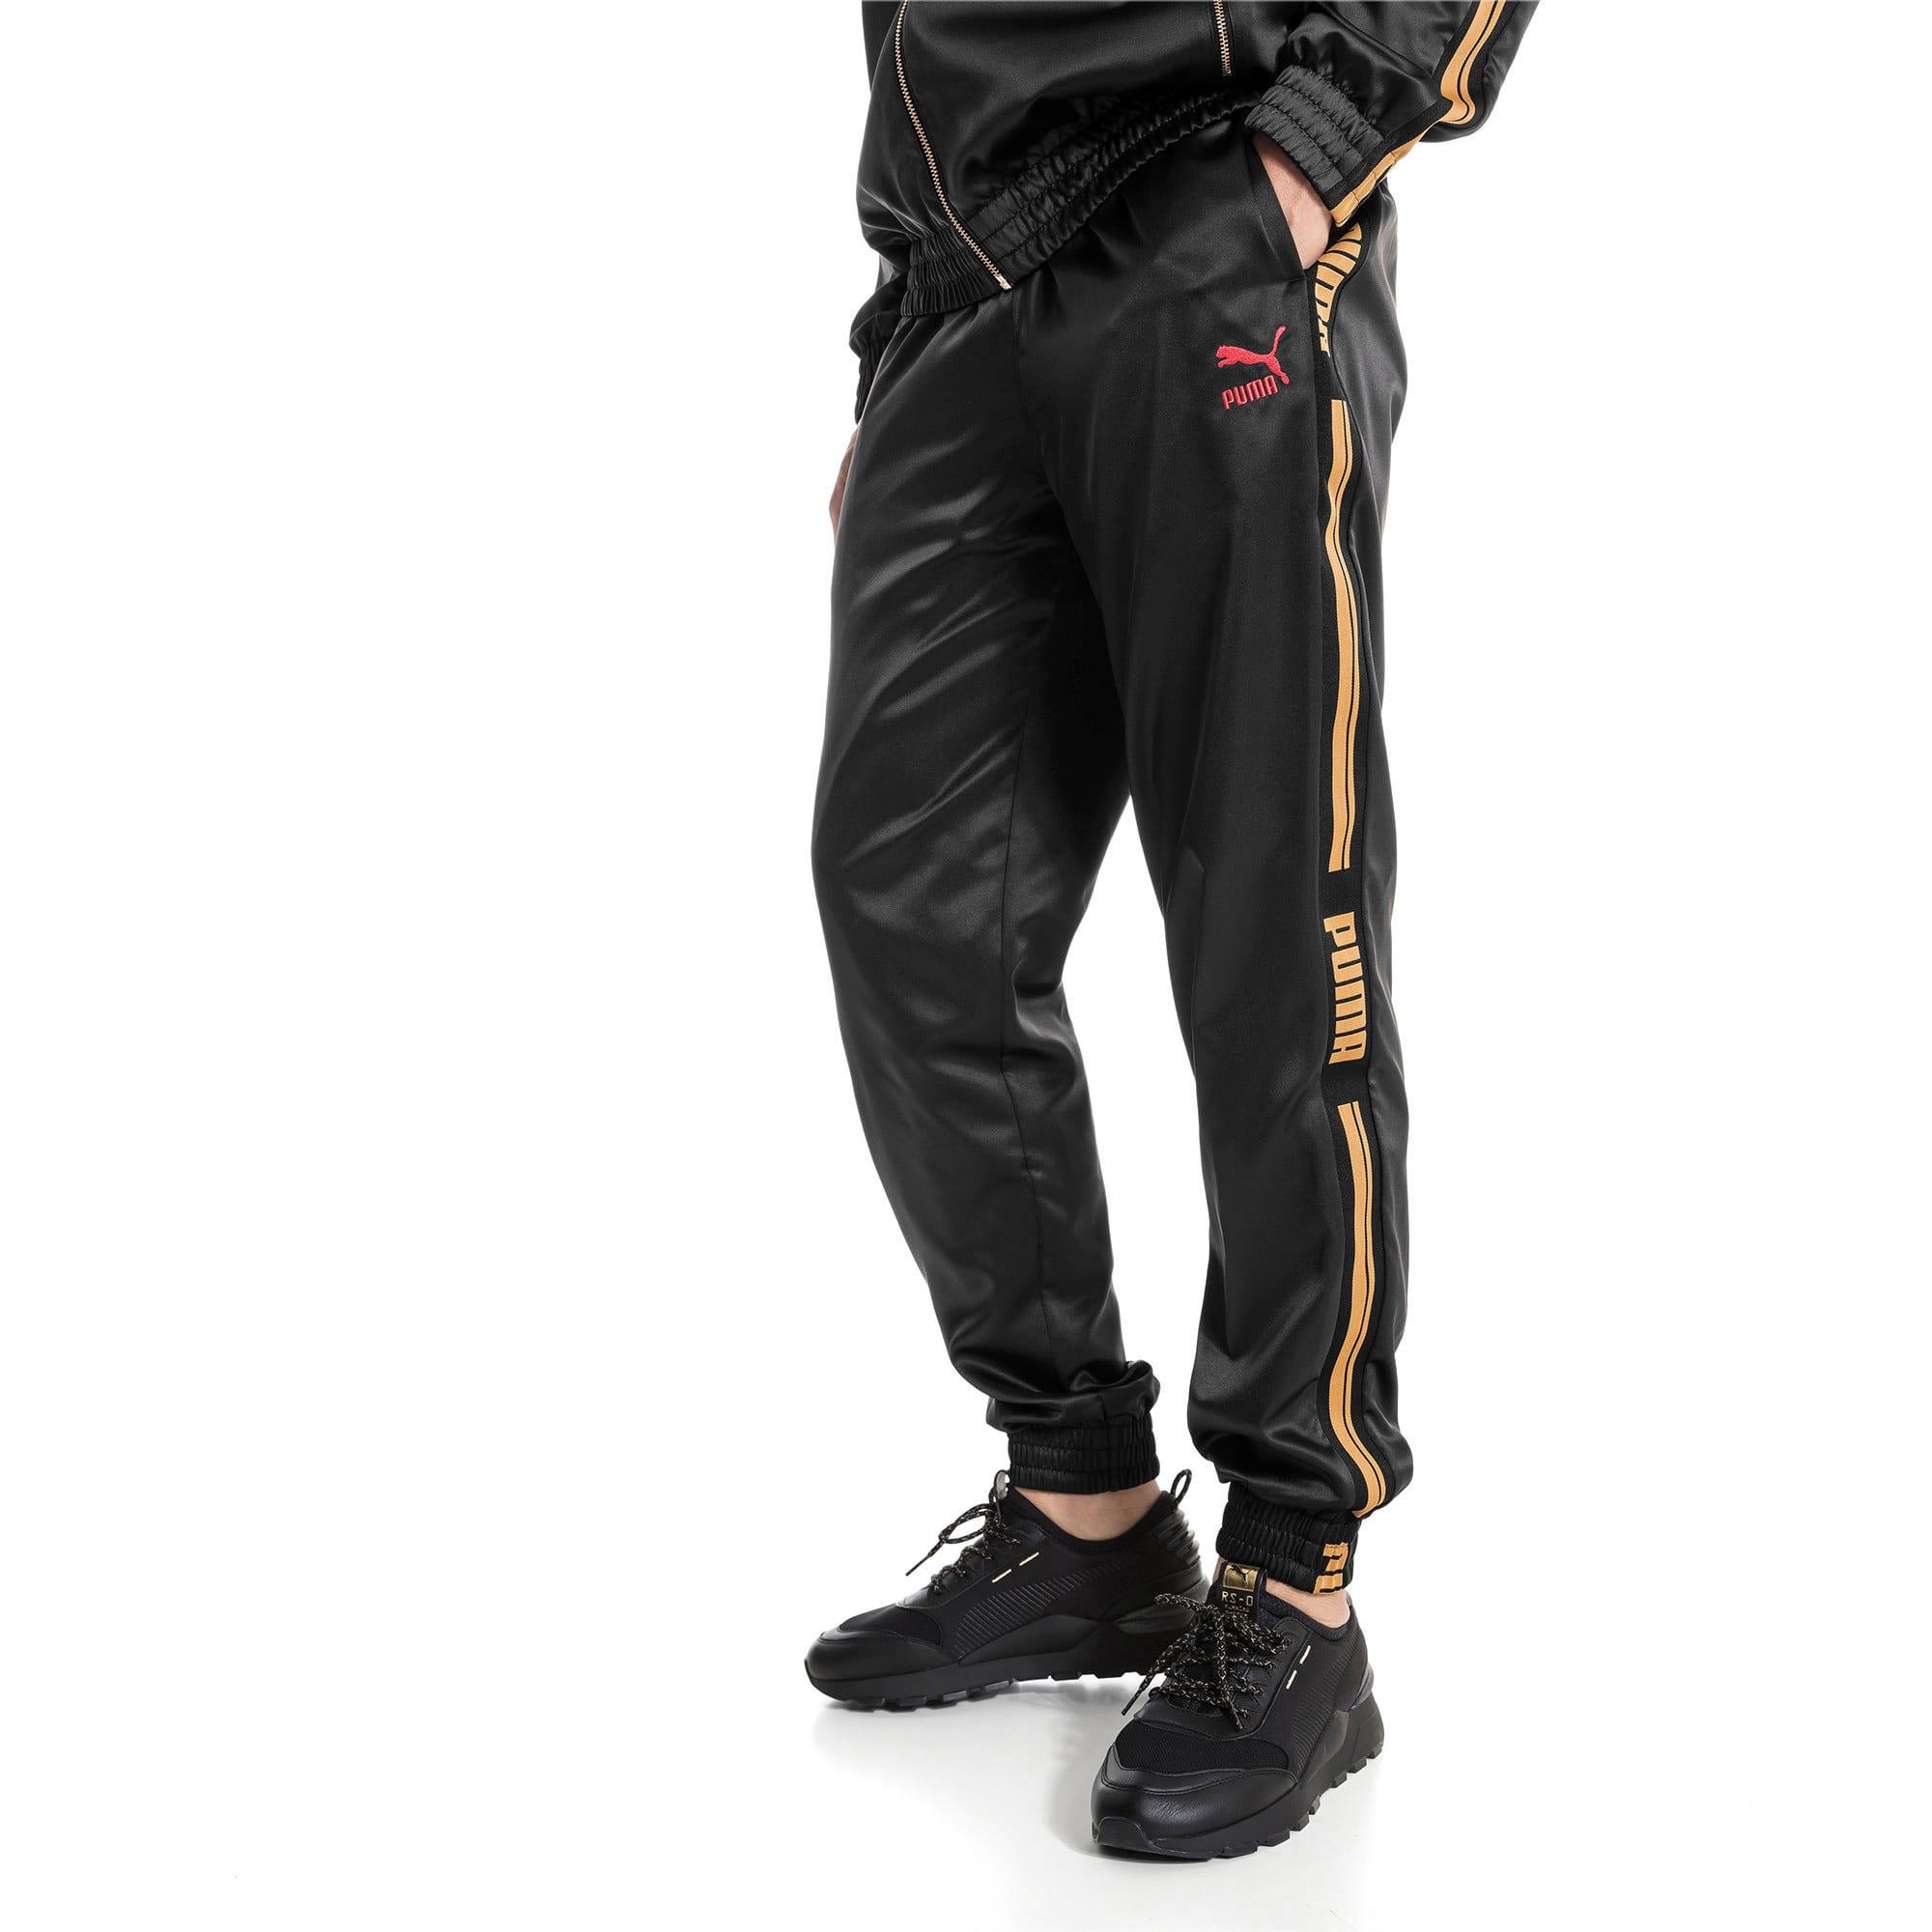 Thumbnail 2 of LUXE PACK Track Pants, Puma Black, medium